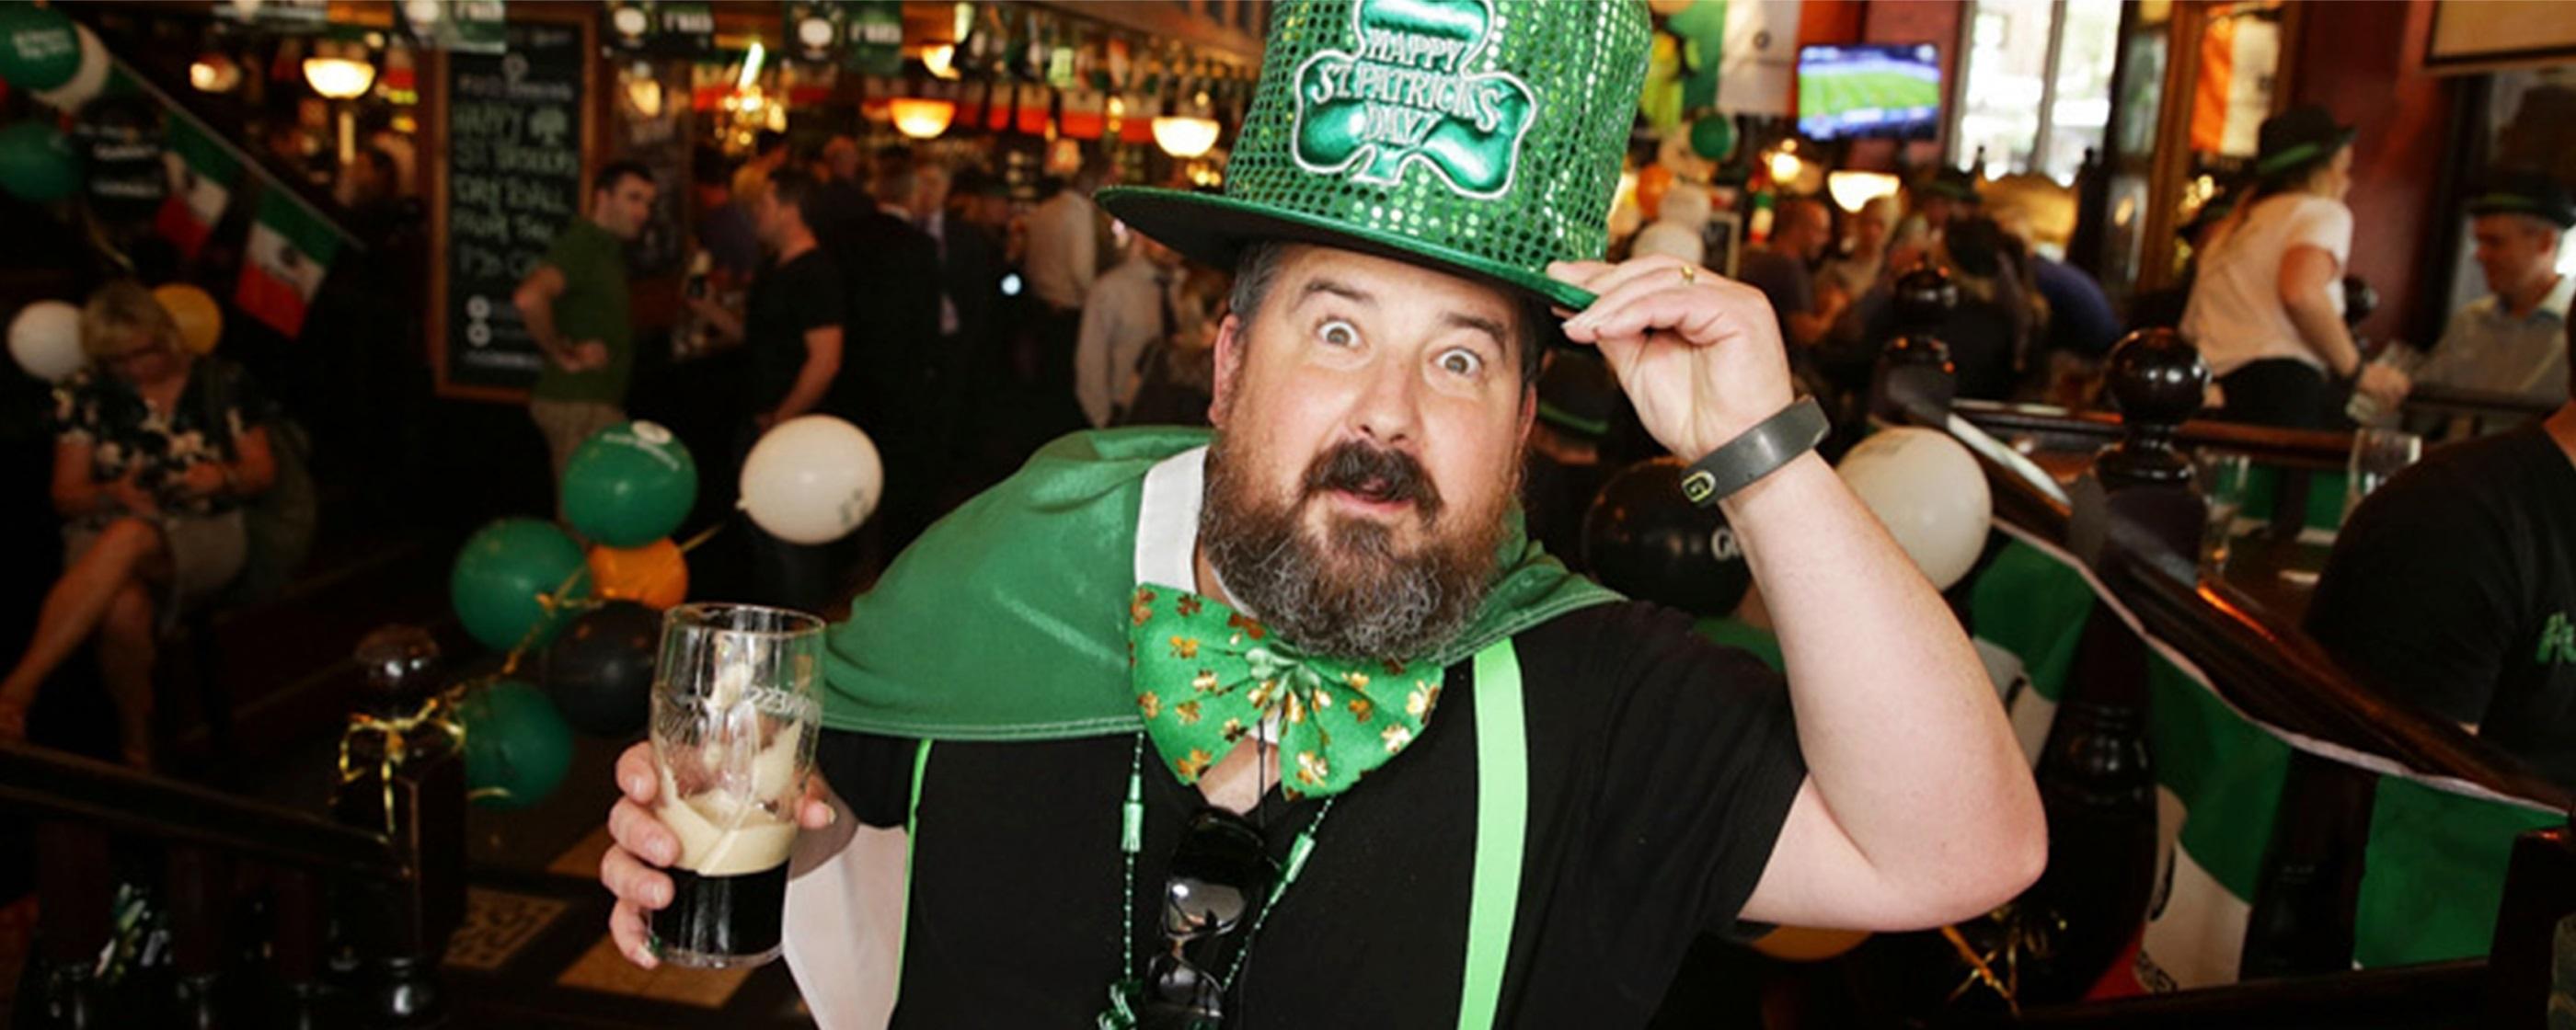 St. Patrick's Day Pub Crawl El Paso Texas